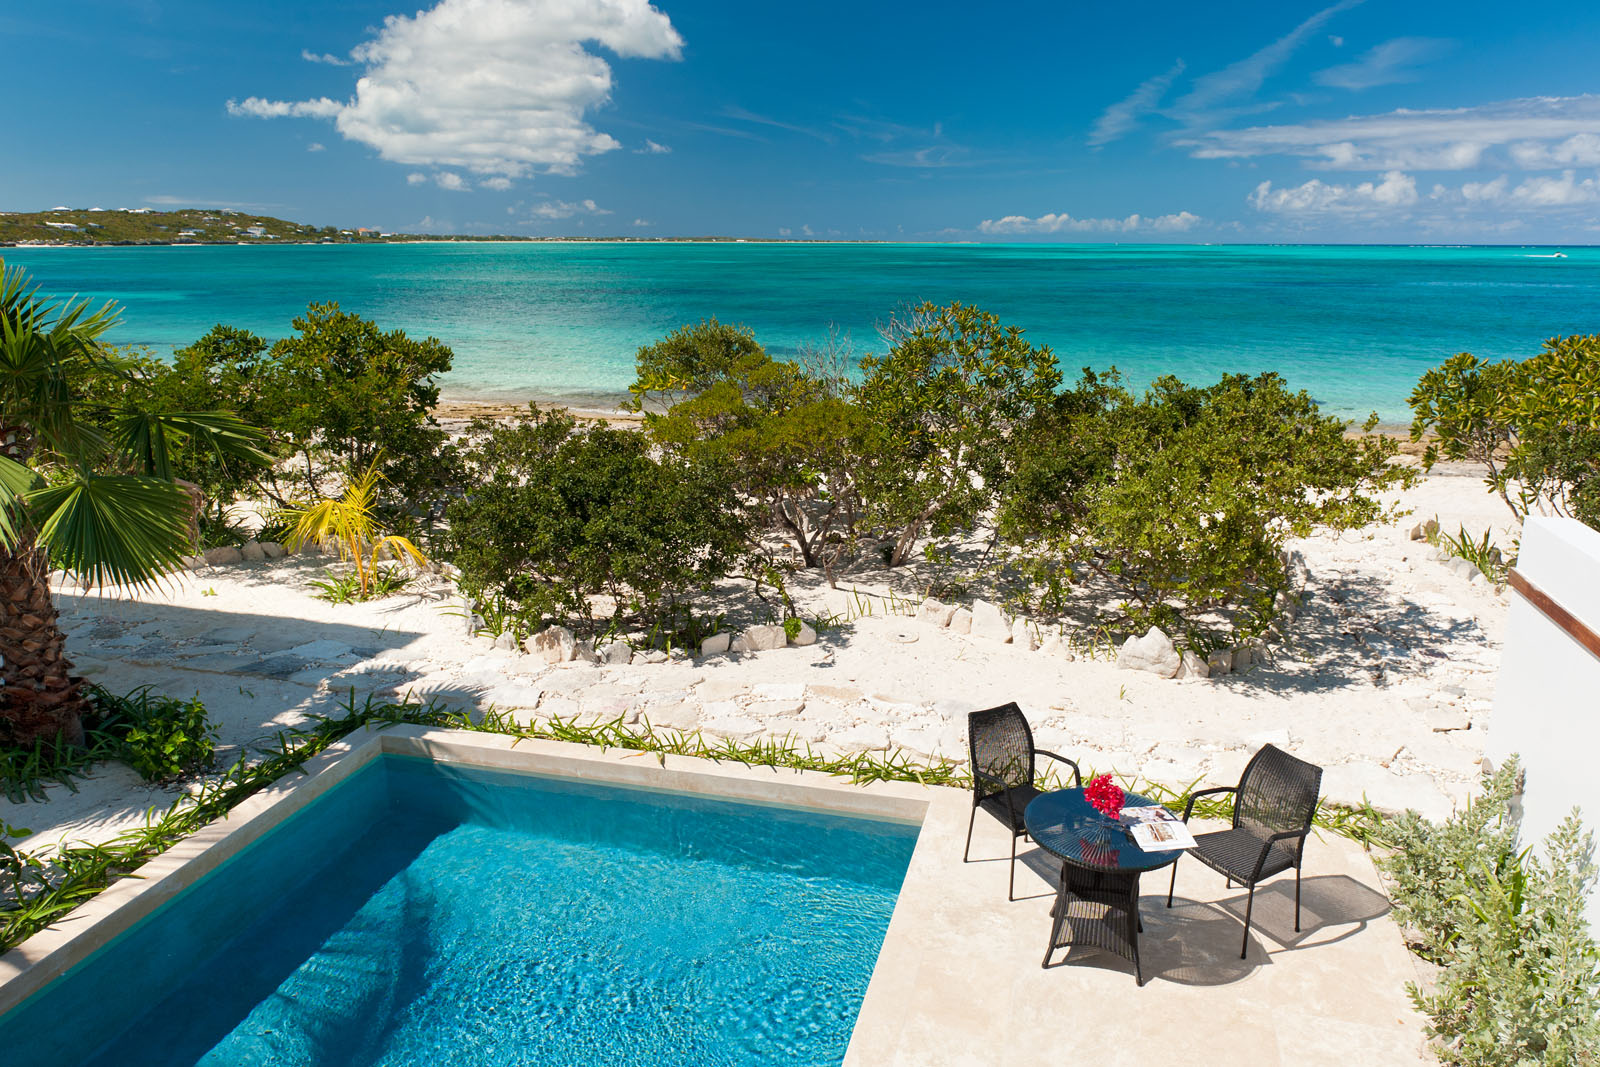 ocean edge villa, grace bay beach, providenciales (provo) / turks